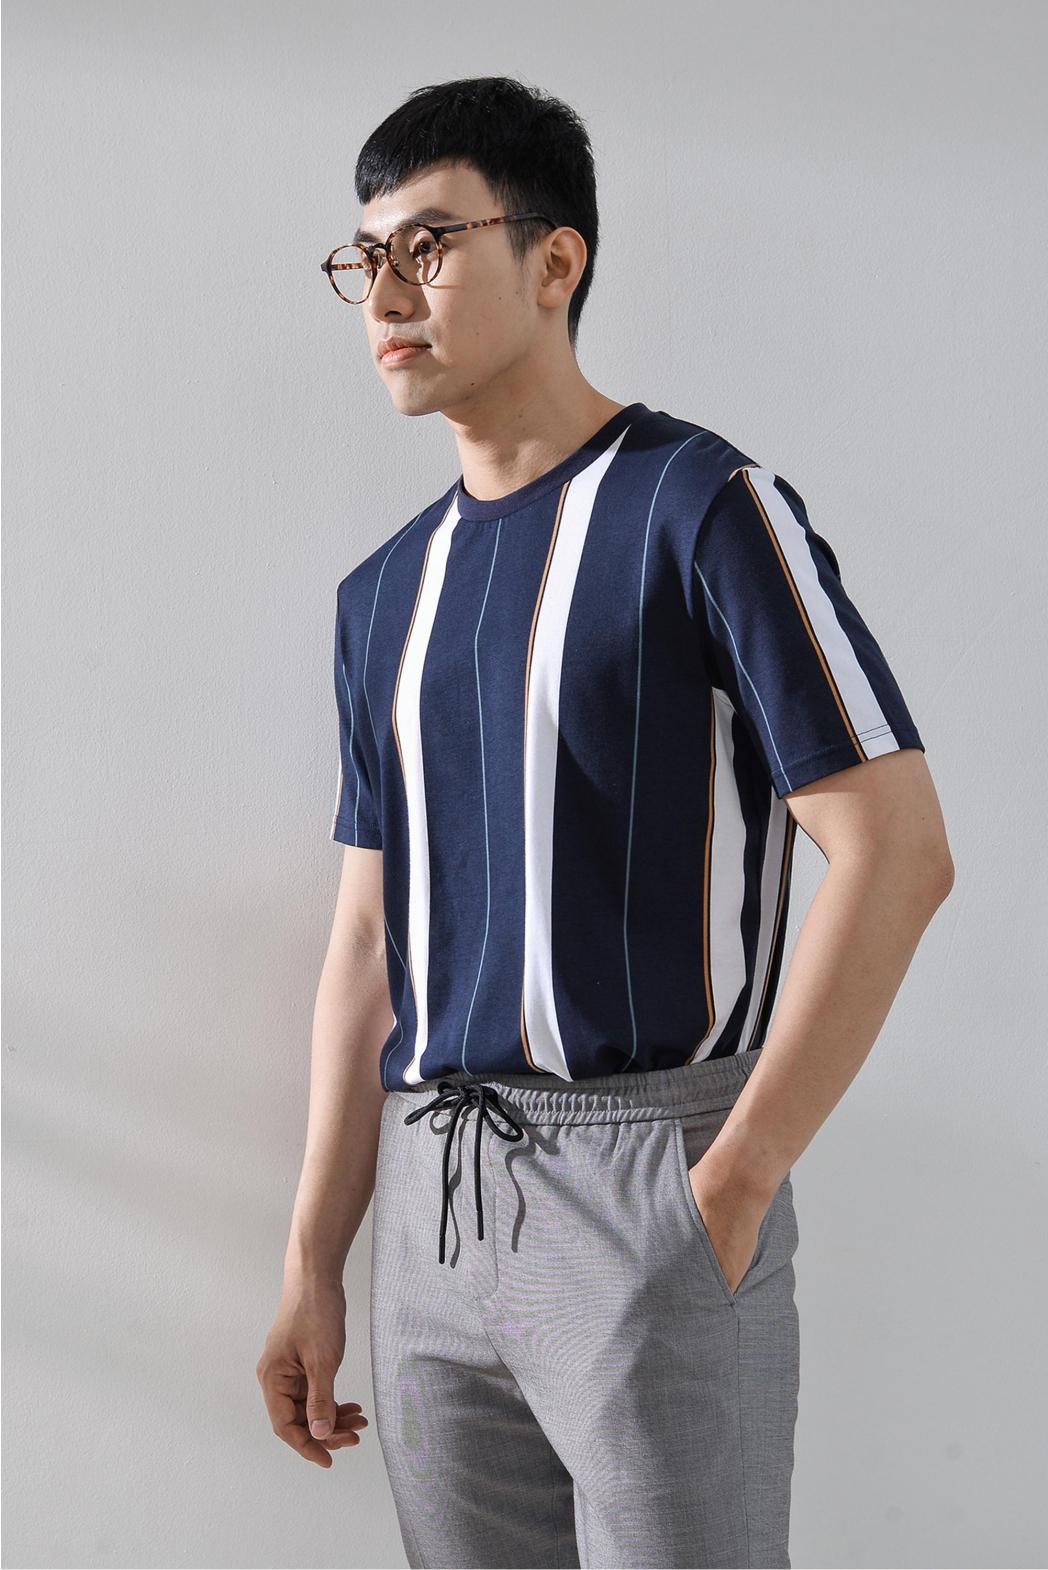 T-SHIRT áo thun. COTTON. REGULAR form - 10S20TSH023